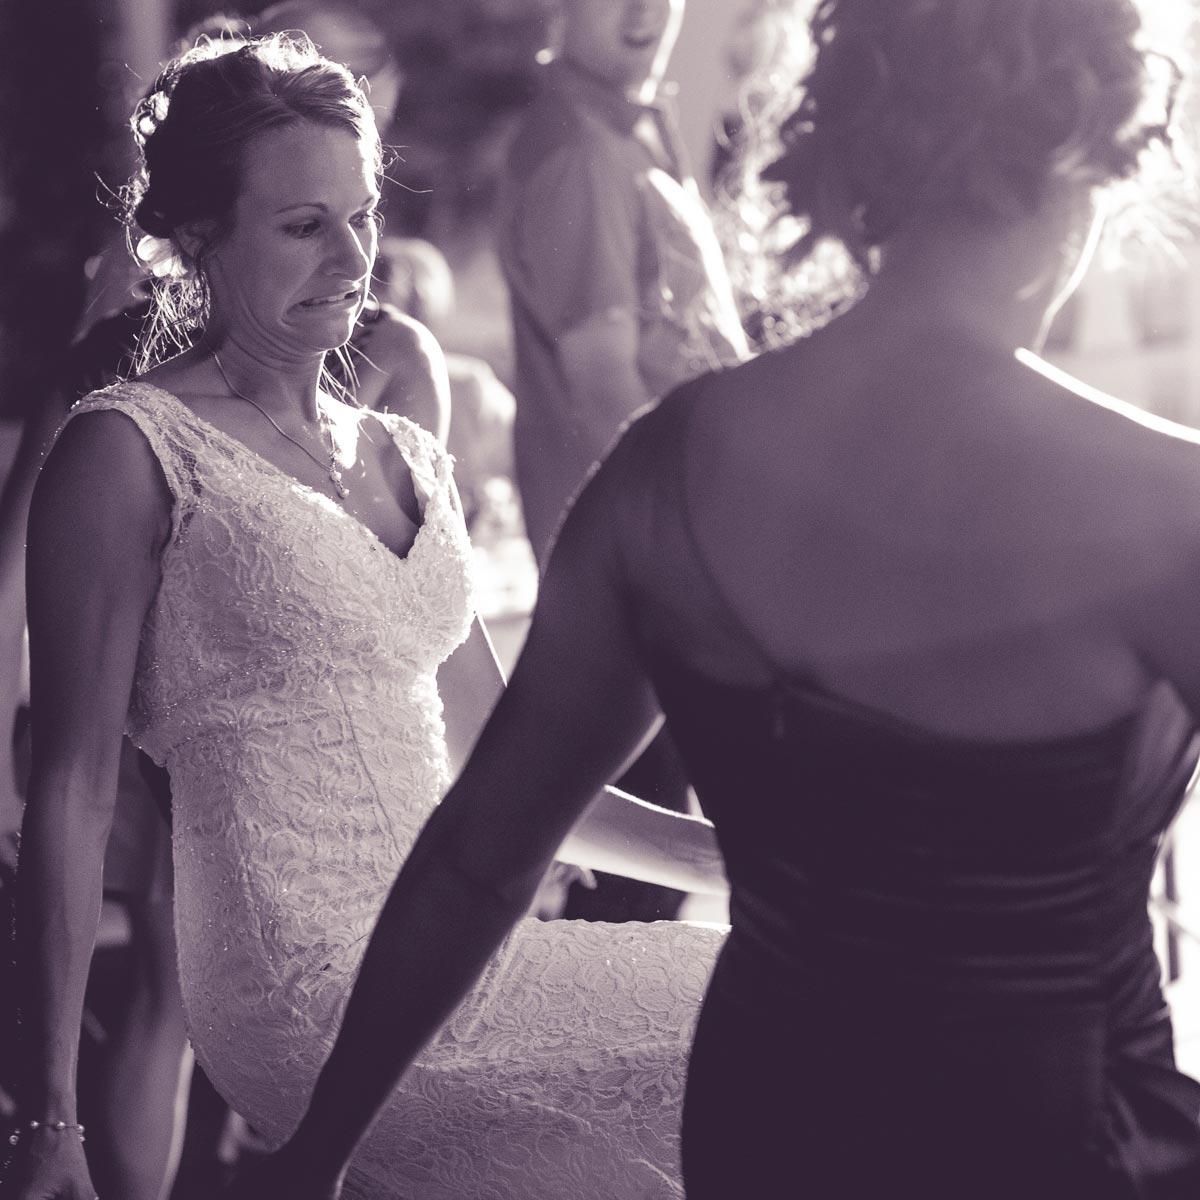 evansville-wedding-photographer-pabst-photo-kokies-echo-valley-(95)